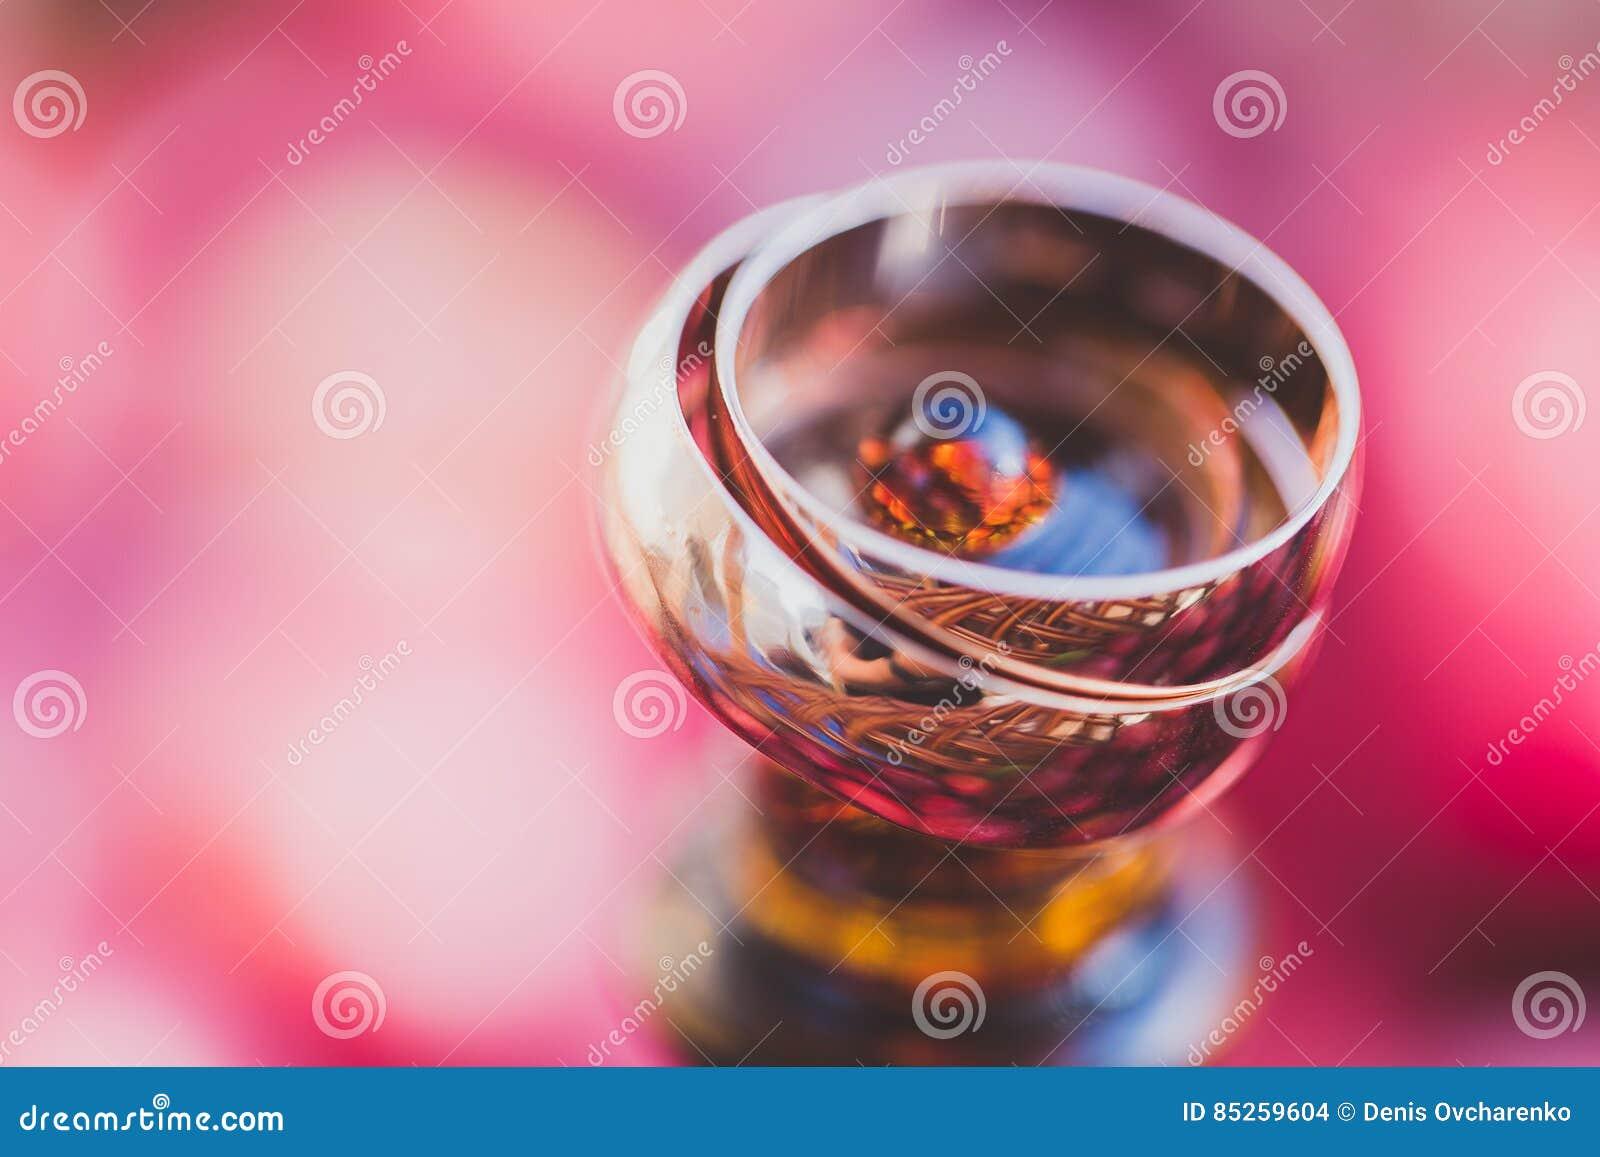 Wedding Rings. Symbols, Attributes. Holiday, Celebration. With Blur ...